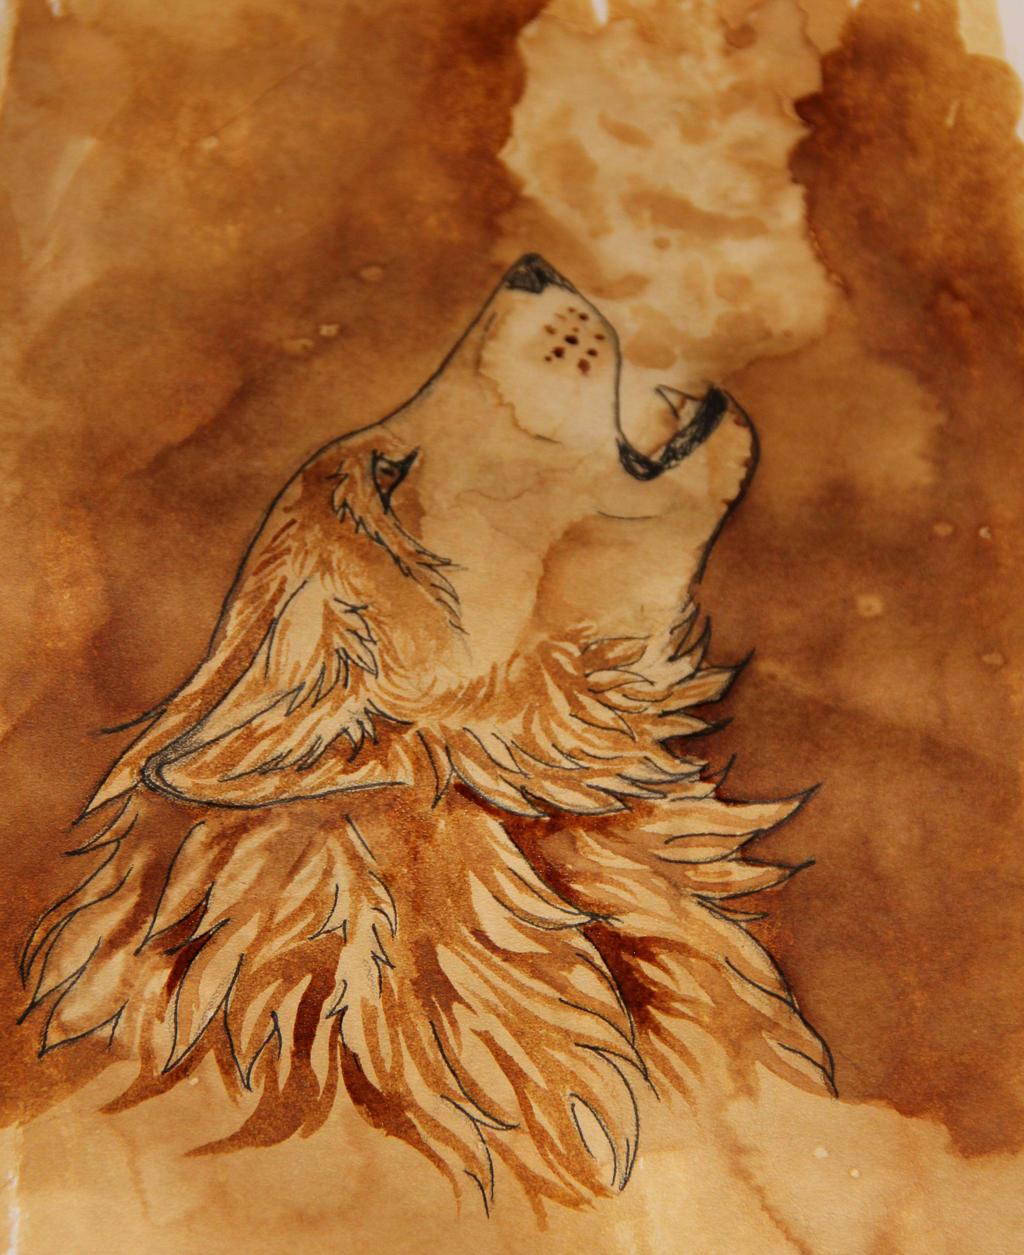 Coffee wolf by RainbowWolfy